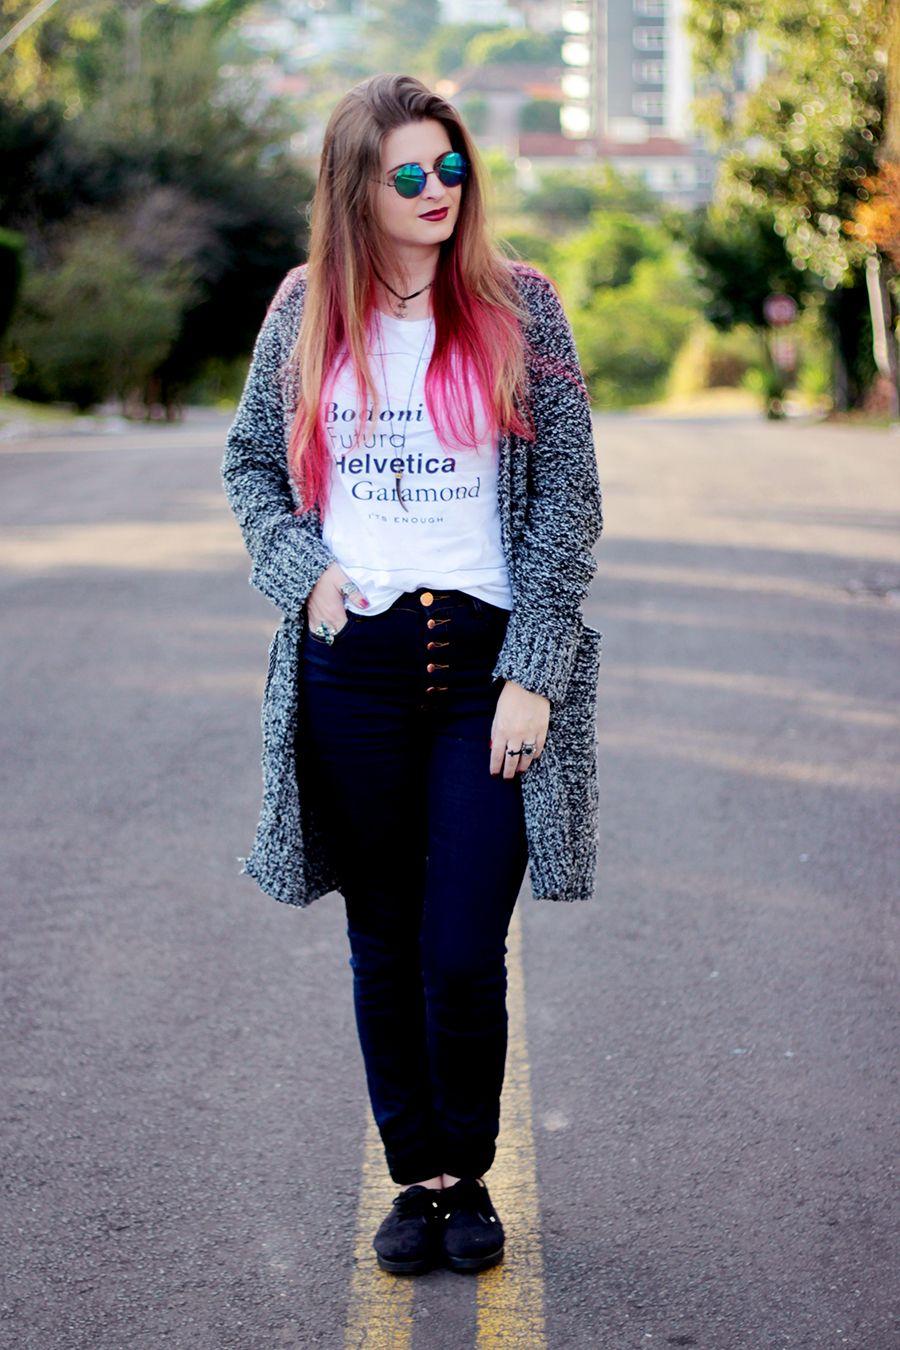 Meninices da Vida: Look Camila Rech: Calça cintura alta, cardigan e creeper